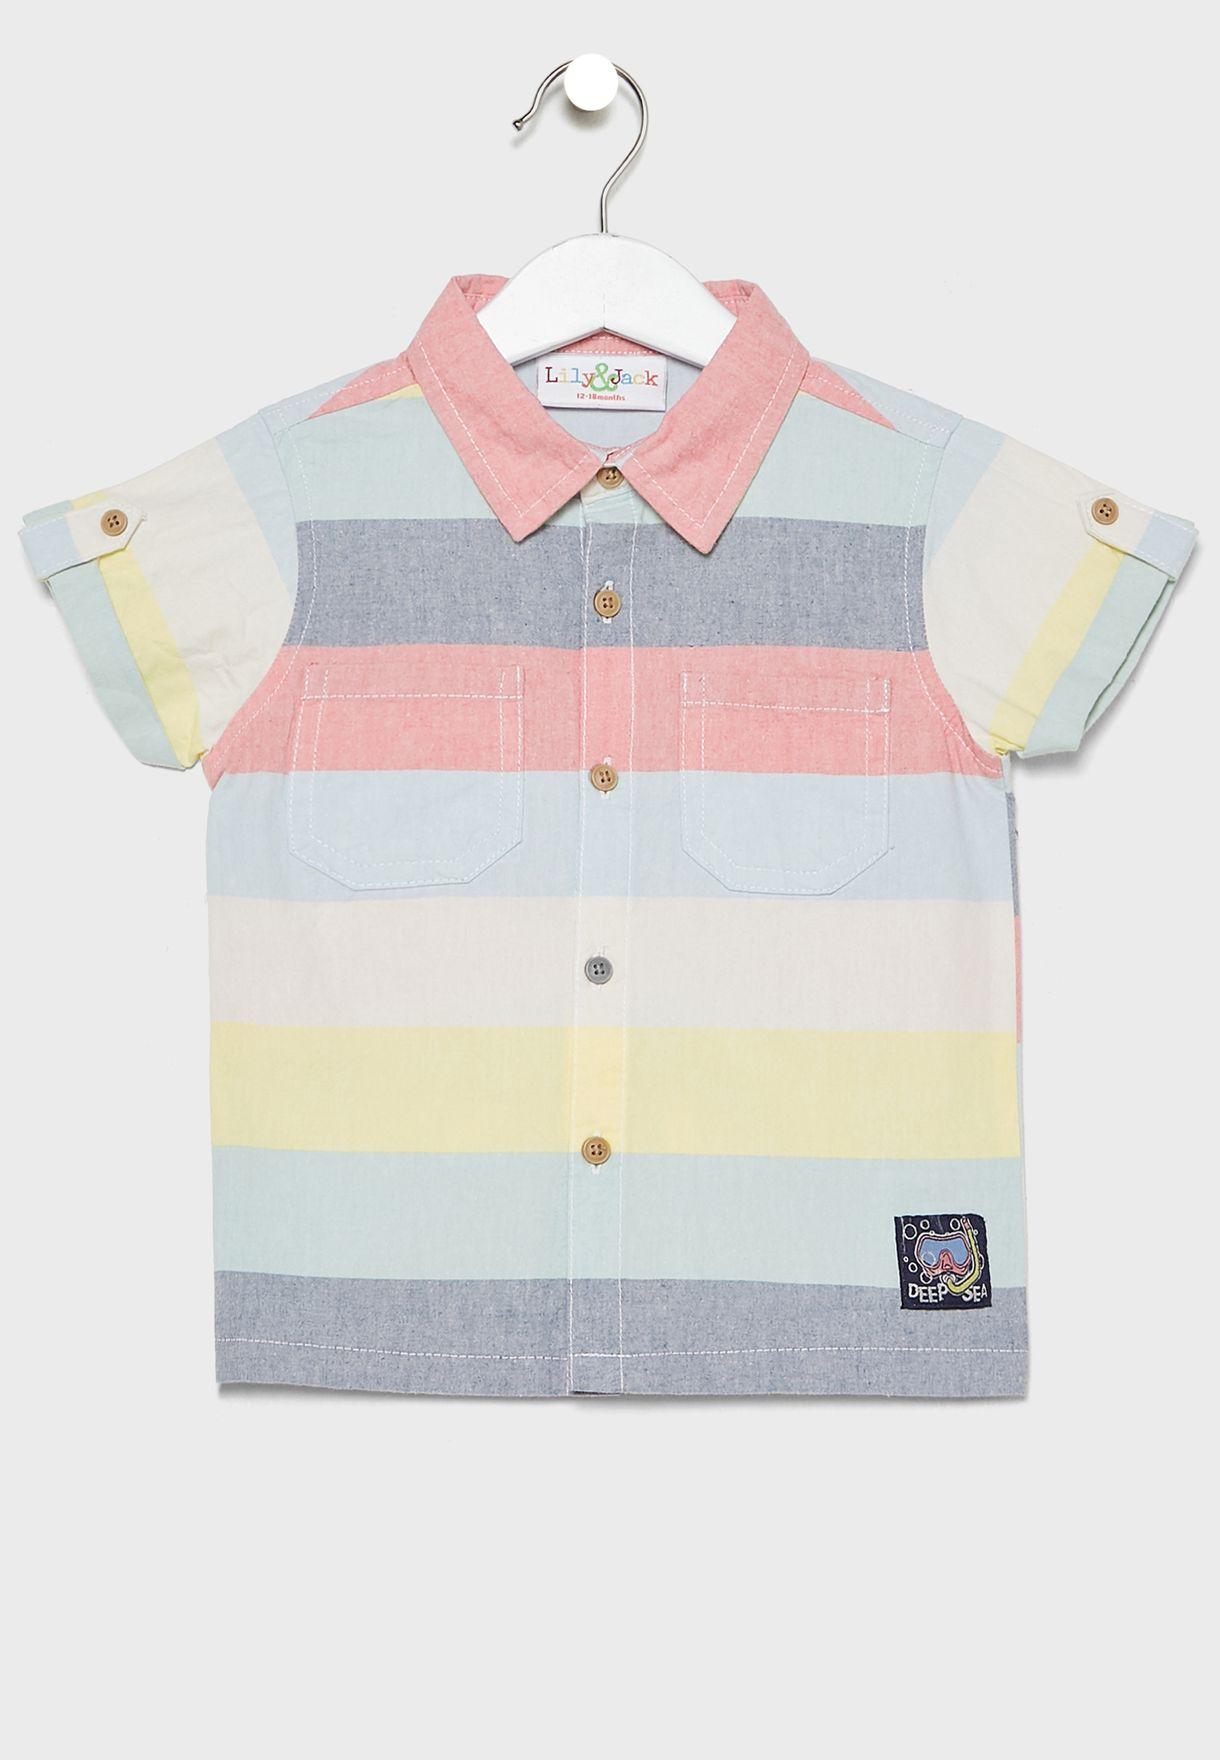 Infant Color Block Shirt + Shorts Set